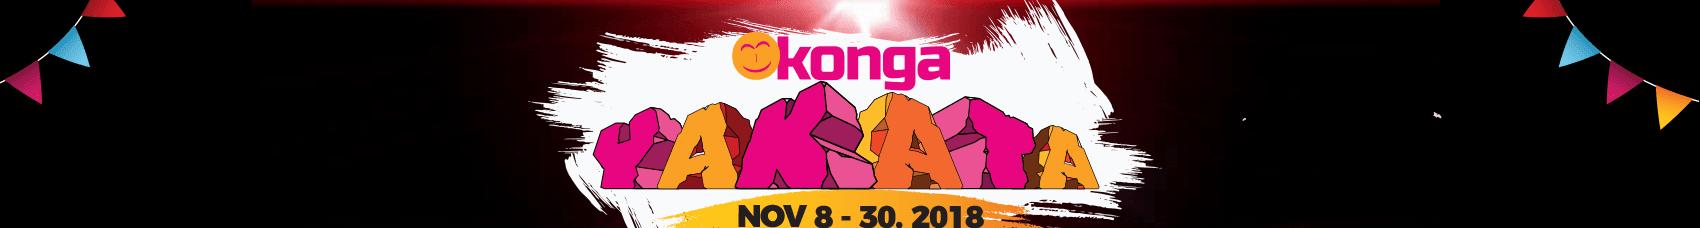 https://www-konga-com-res.cloudinary.com/image/upload/v1543588398/landingPages/yakata2018/yakataOver_1.png